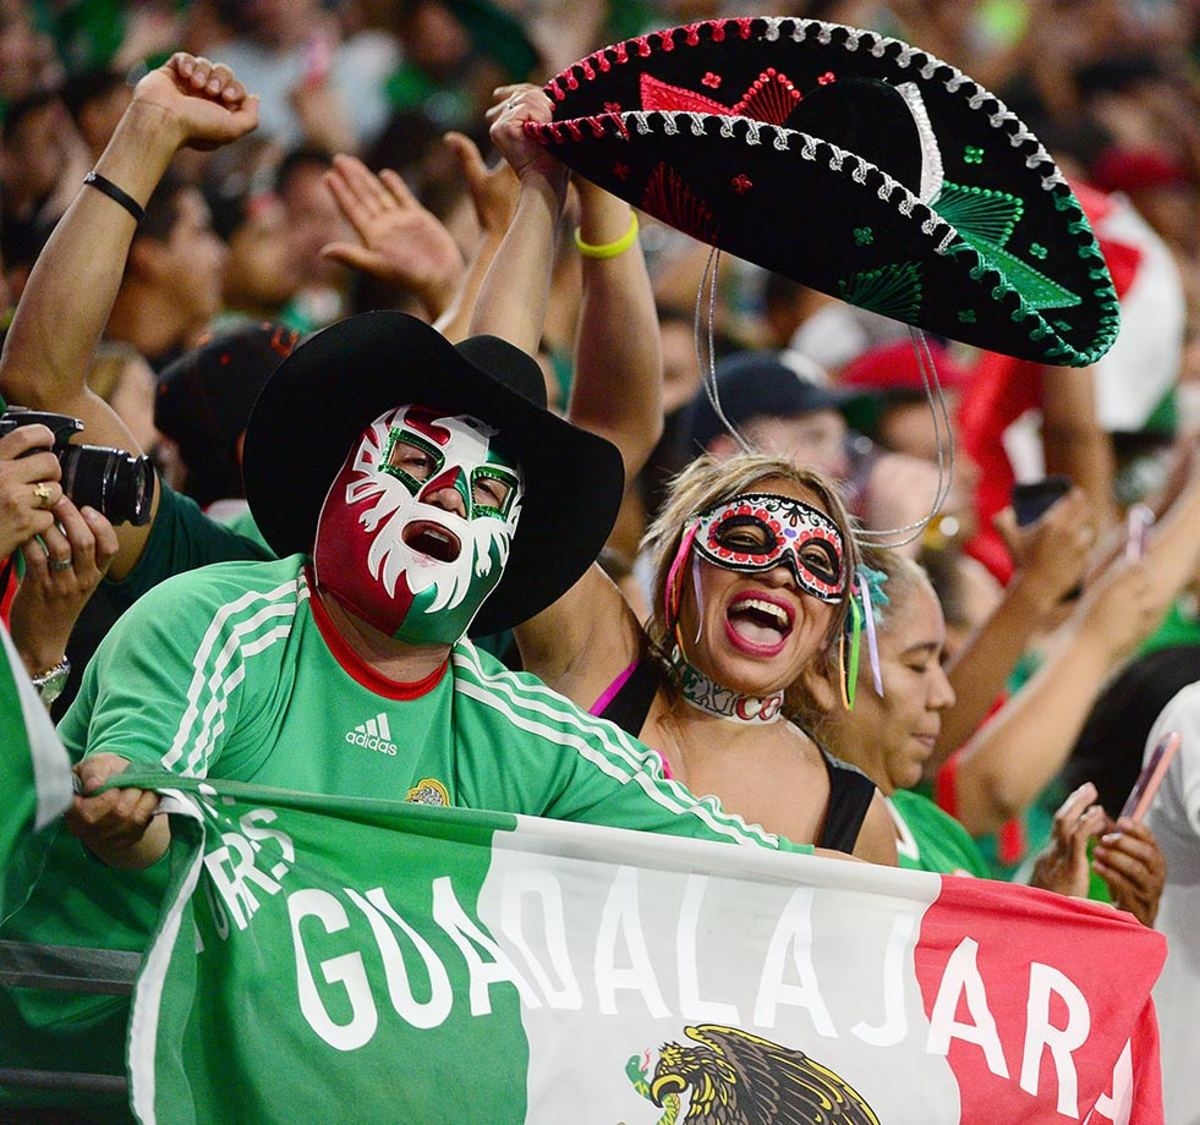 Mexico-fans-538311582.jpg